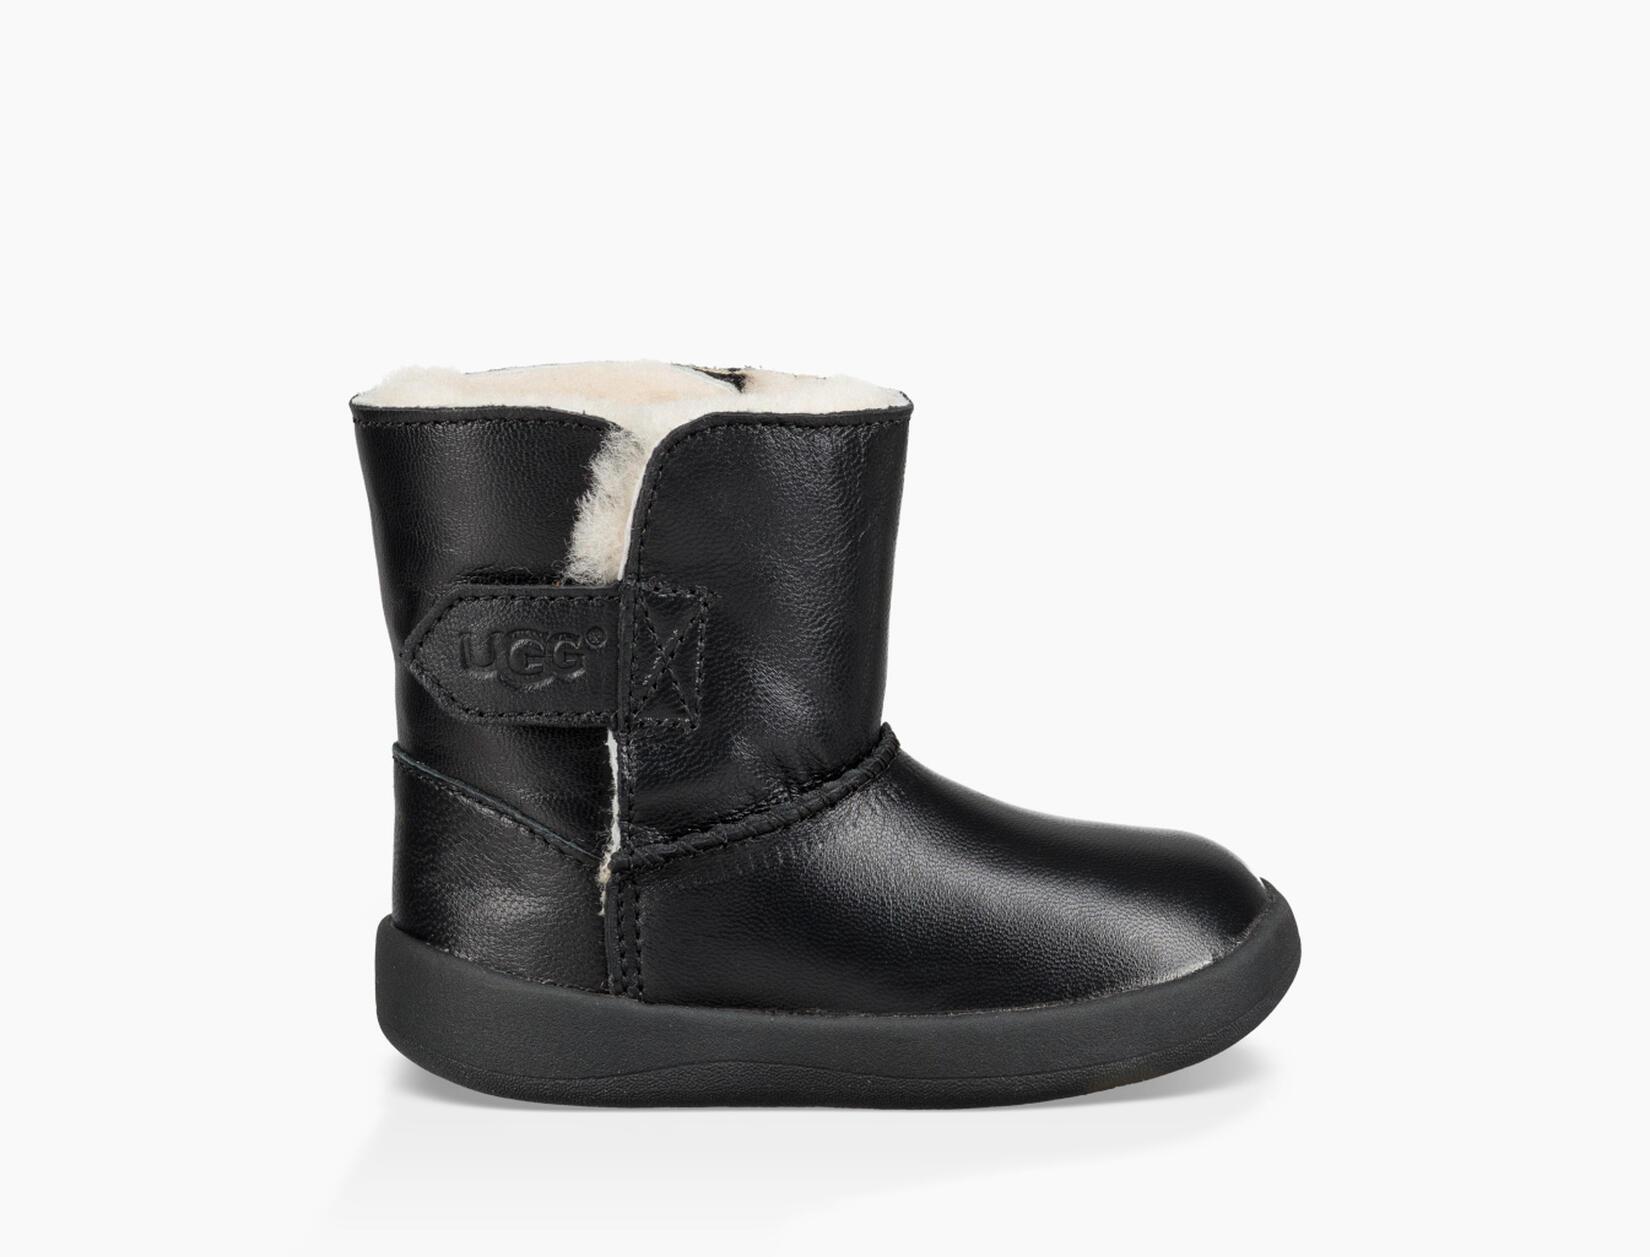 Keelan Leather Bootie